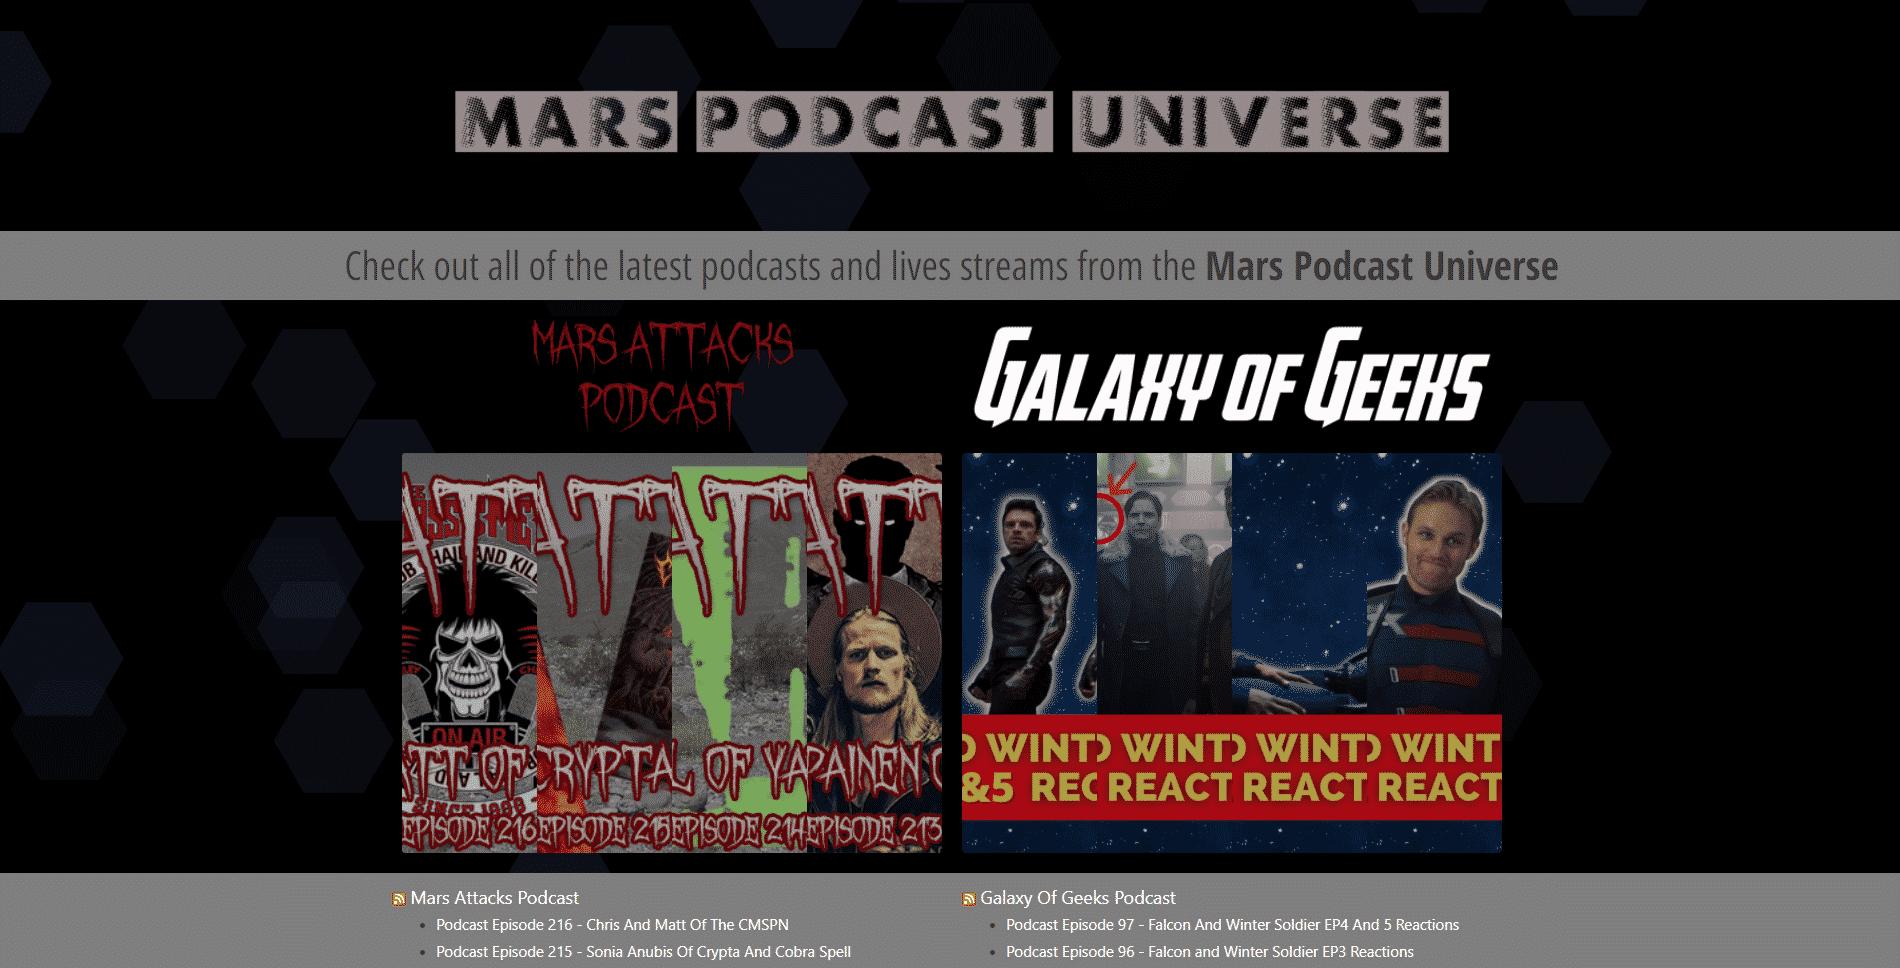 Mars_Podcasting_Universe_Screenshot